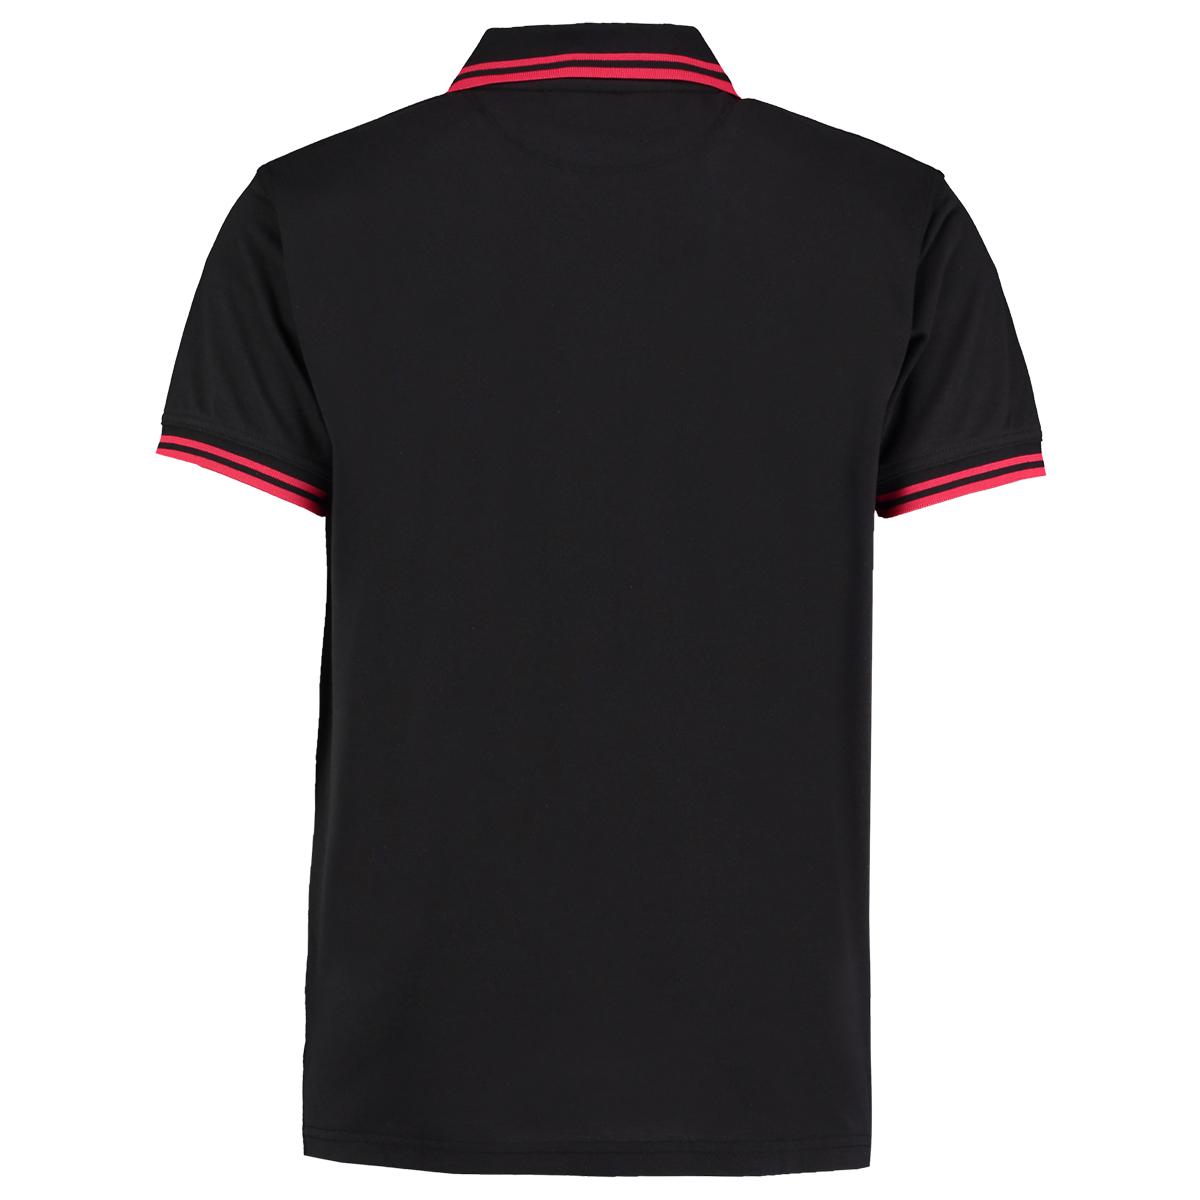 Mens Contrast Cuff Shirts